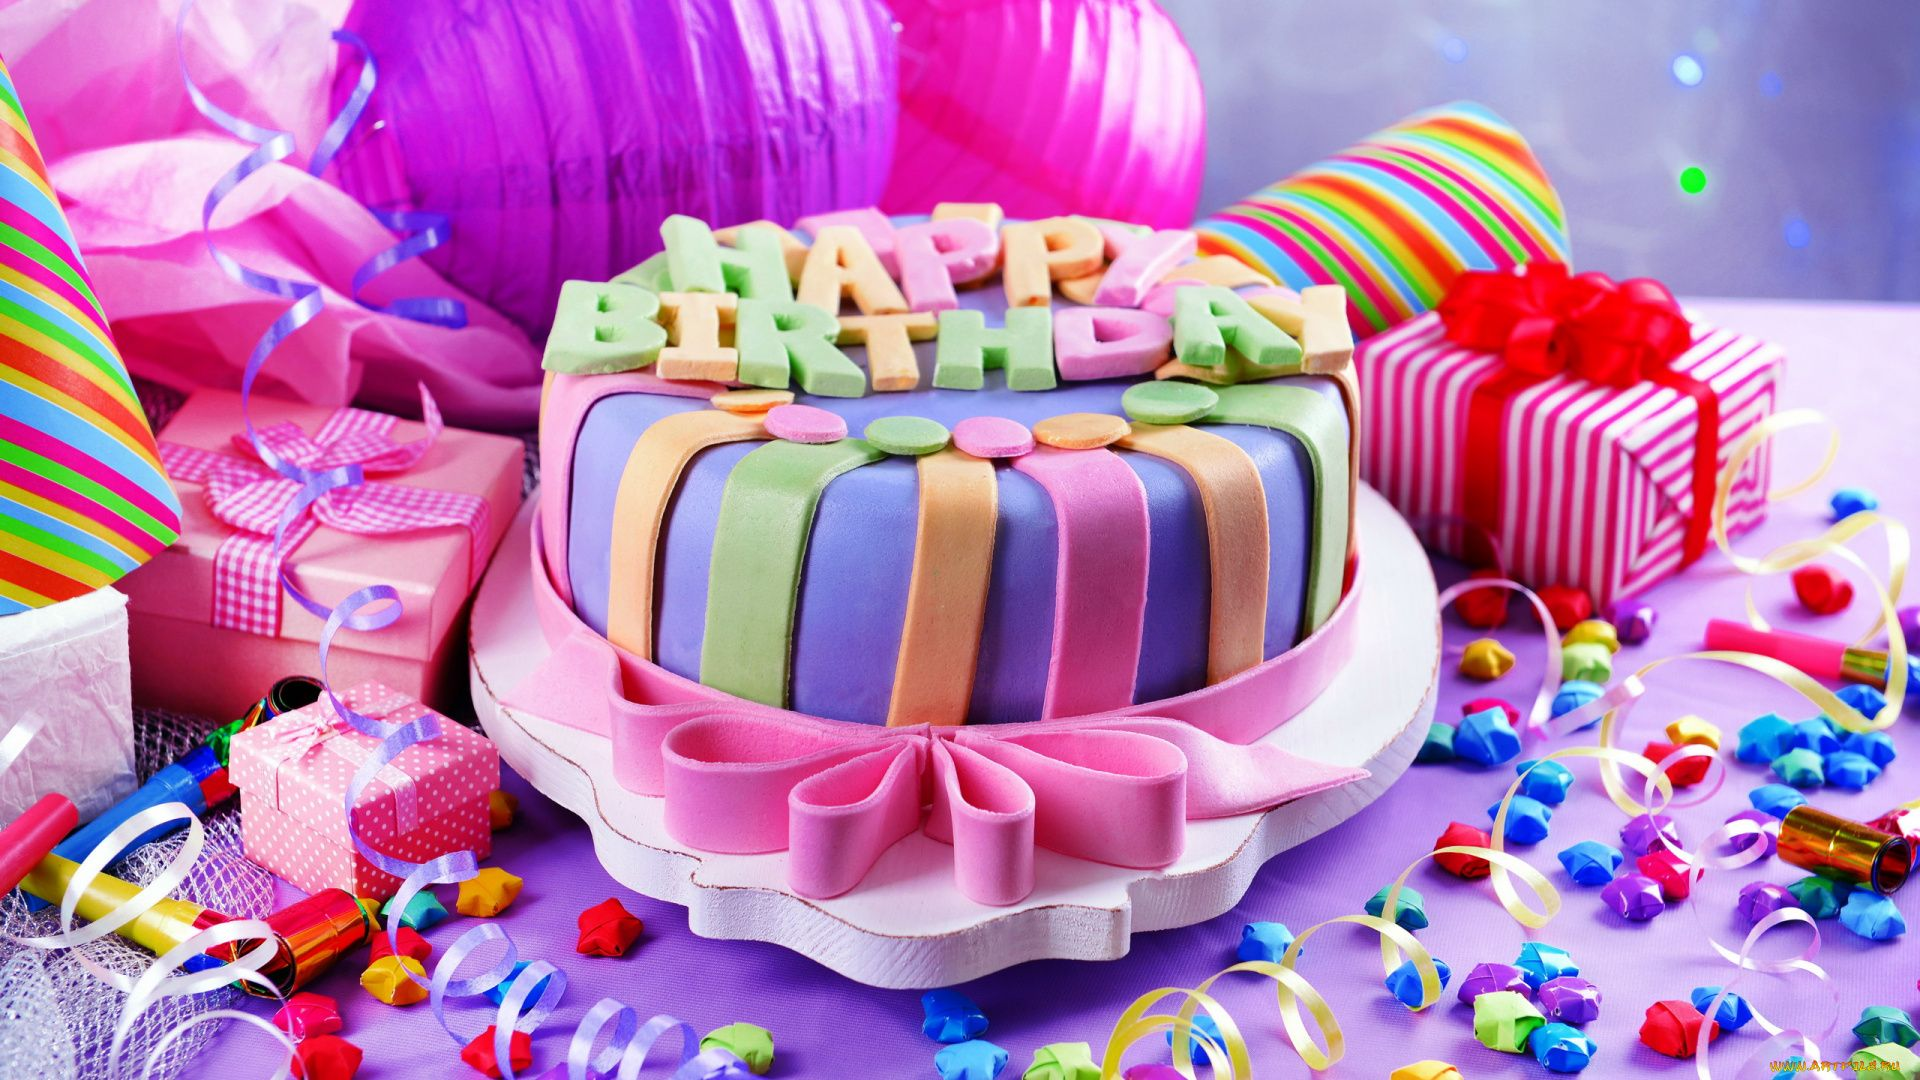 Birthday Cake PC Wallpaper